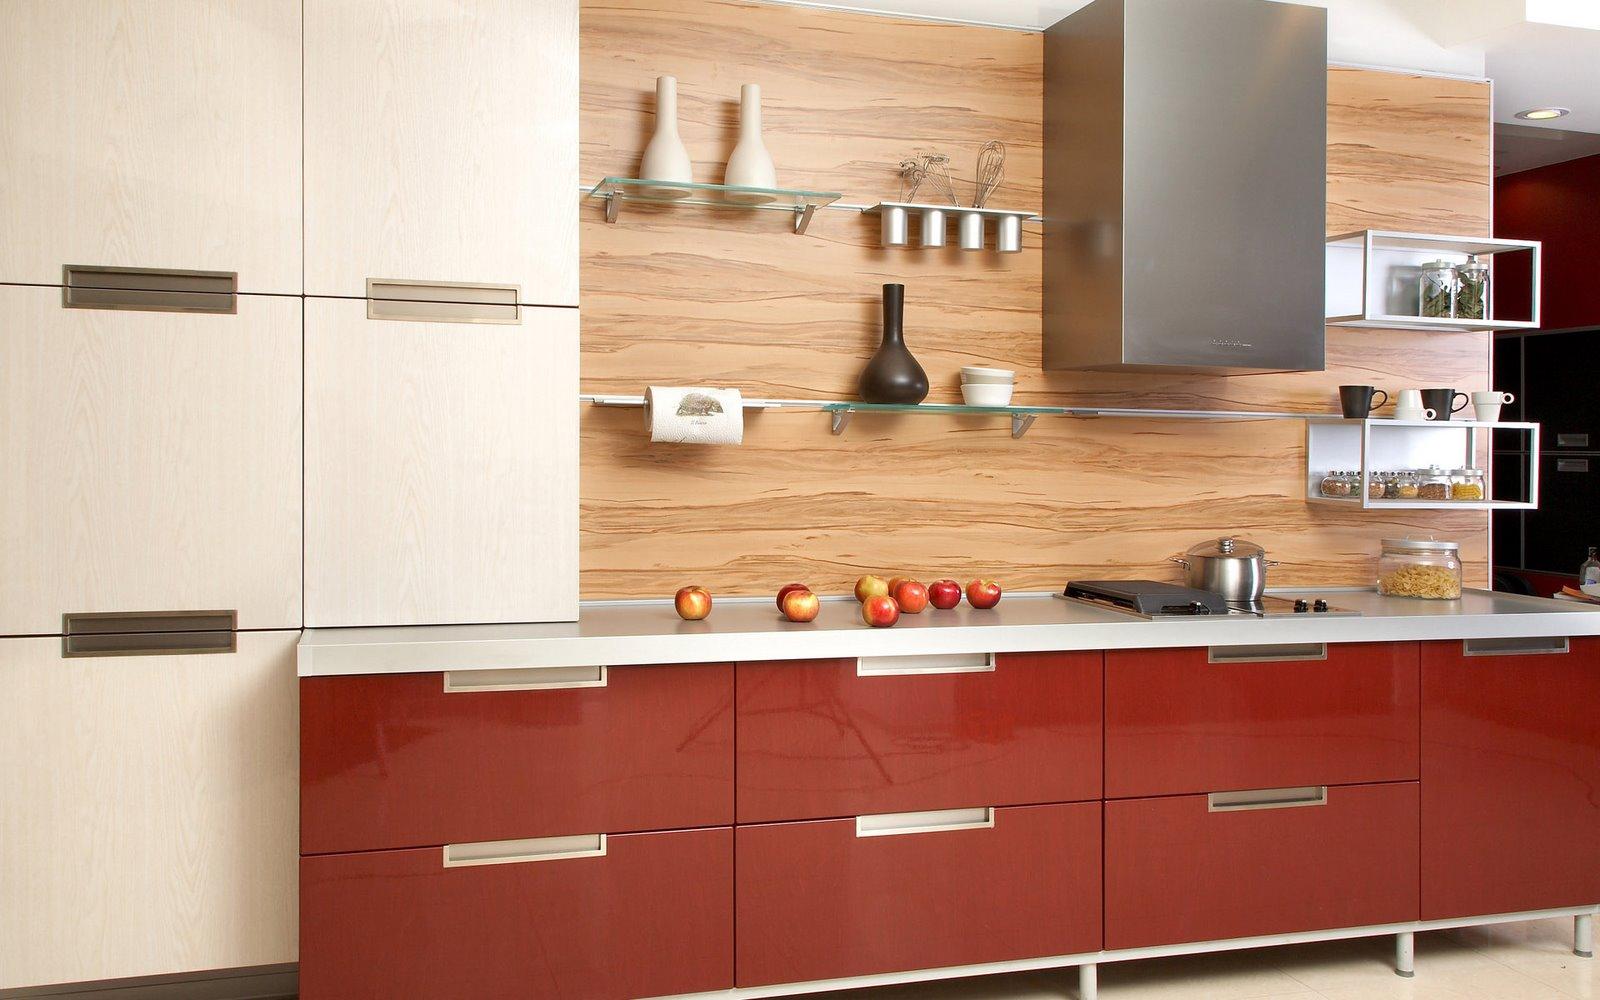 30 Modern Kitchen Design Ideas – The WoW Style